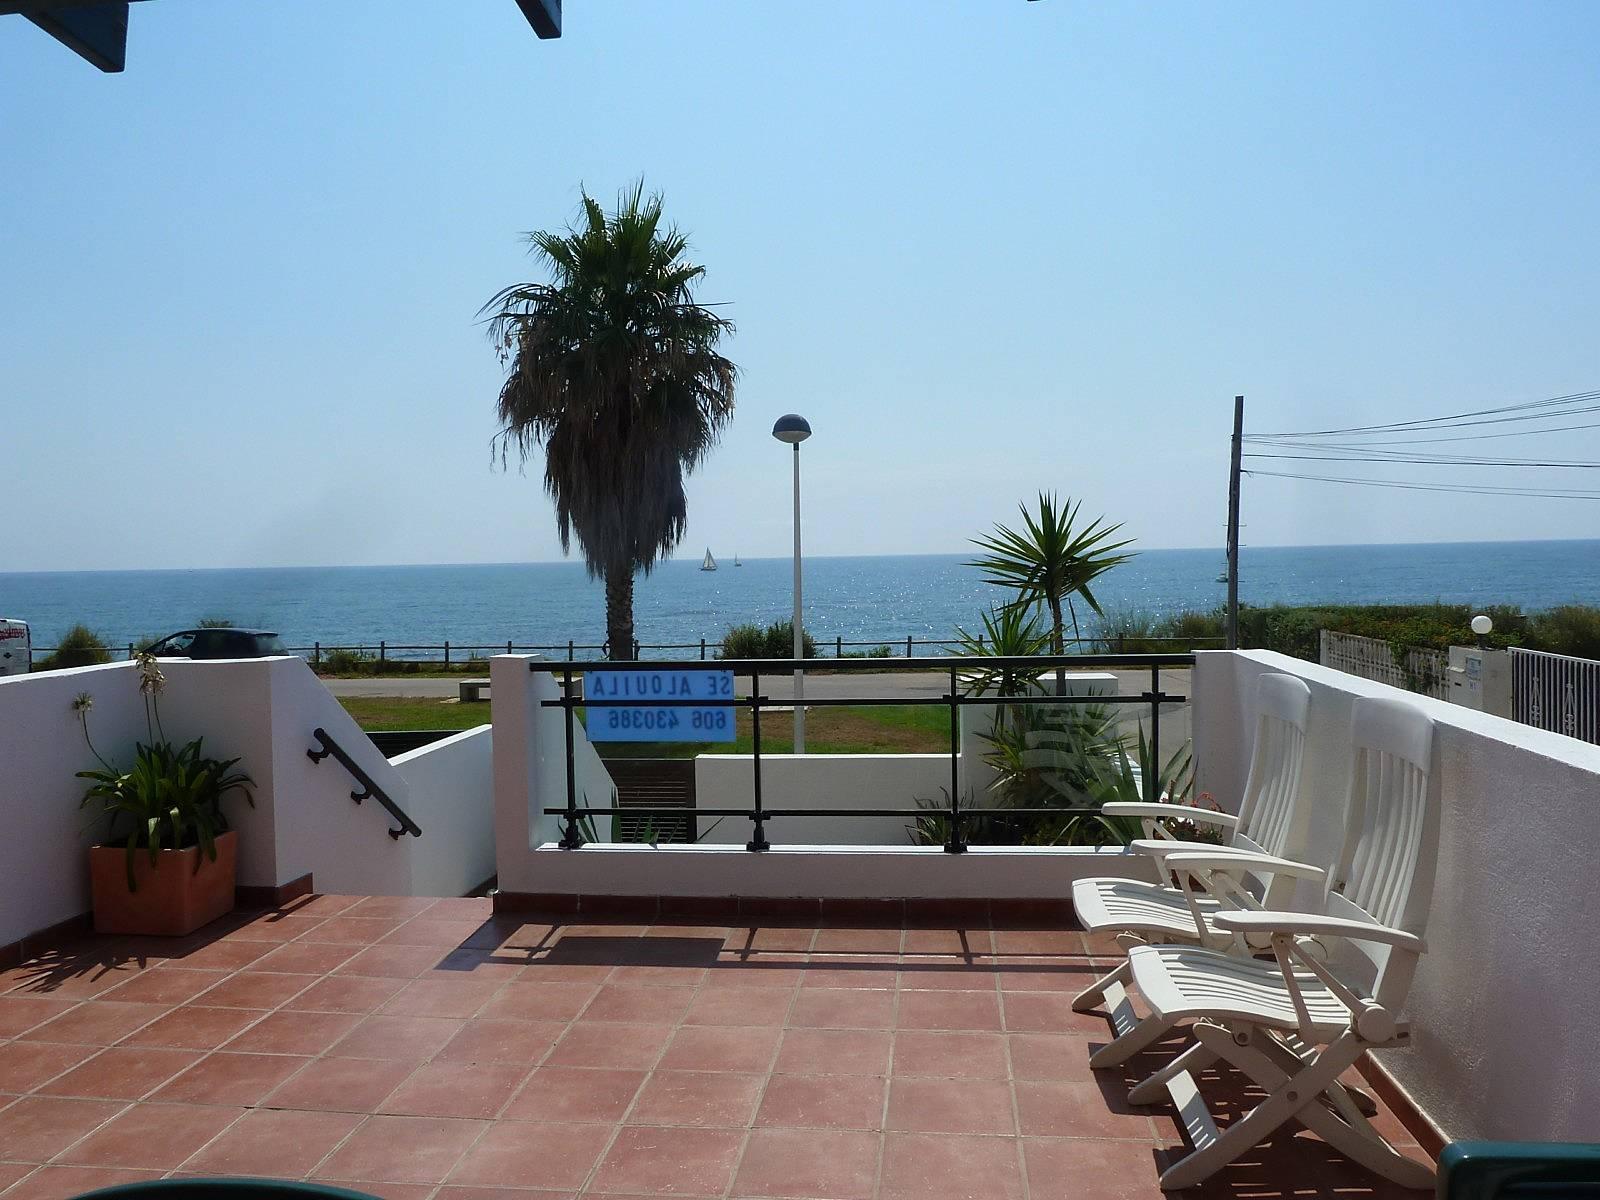 apartamento en 1a l nea de playa con piscina vinar s